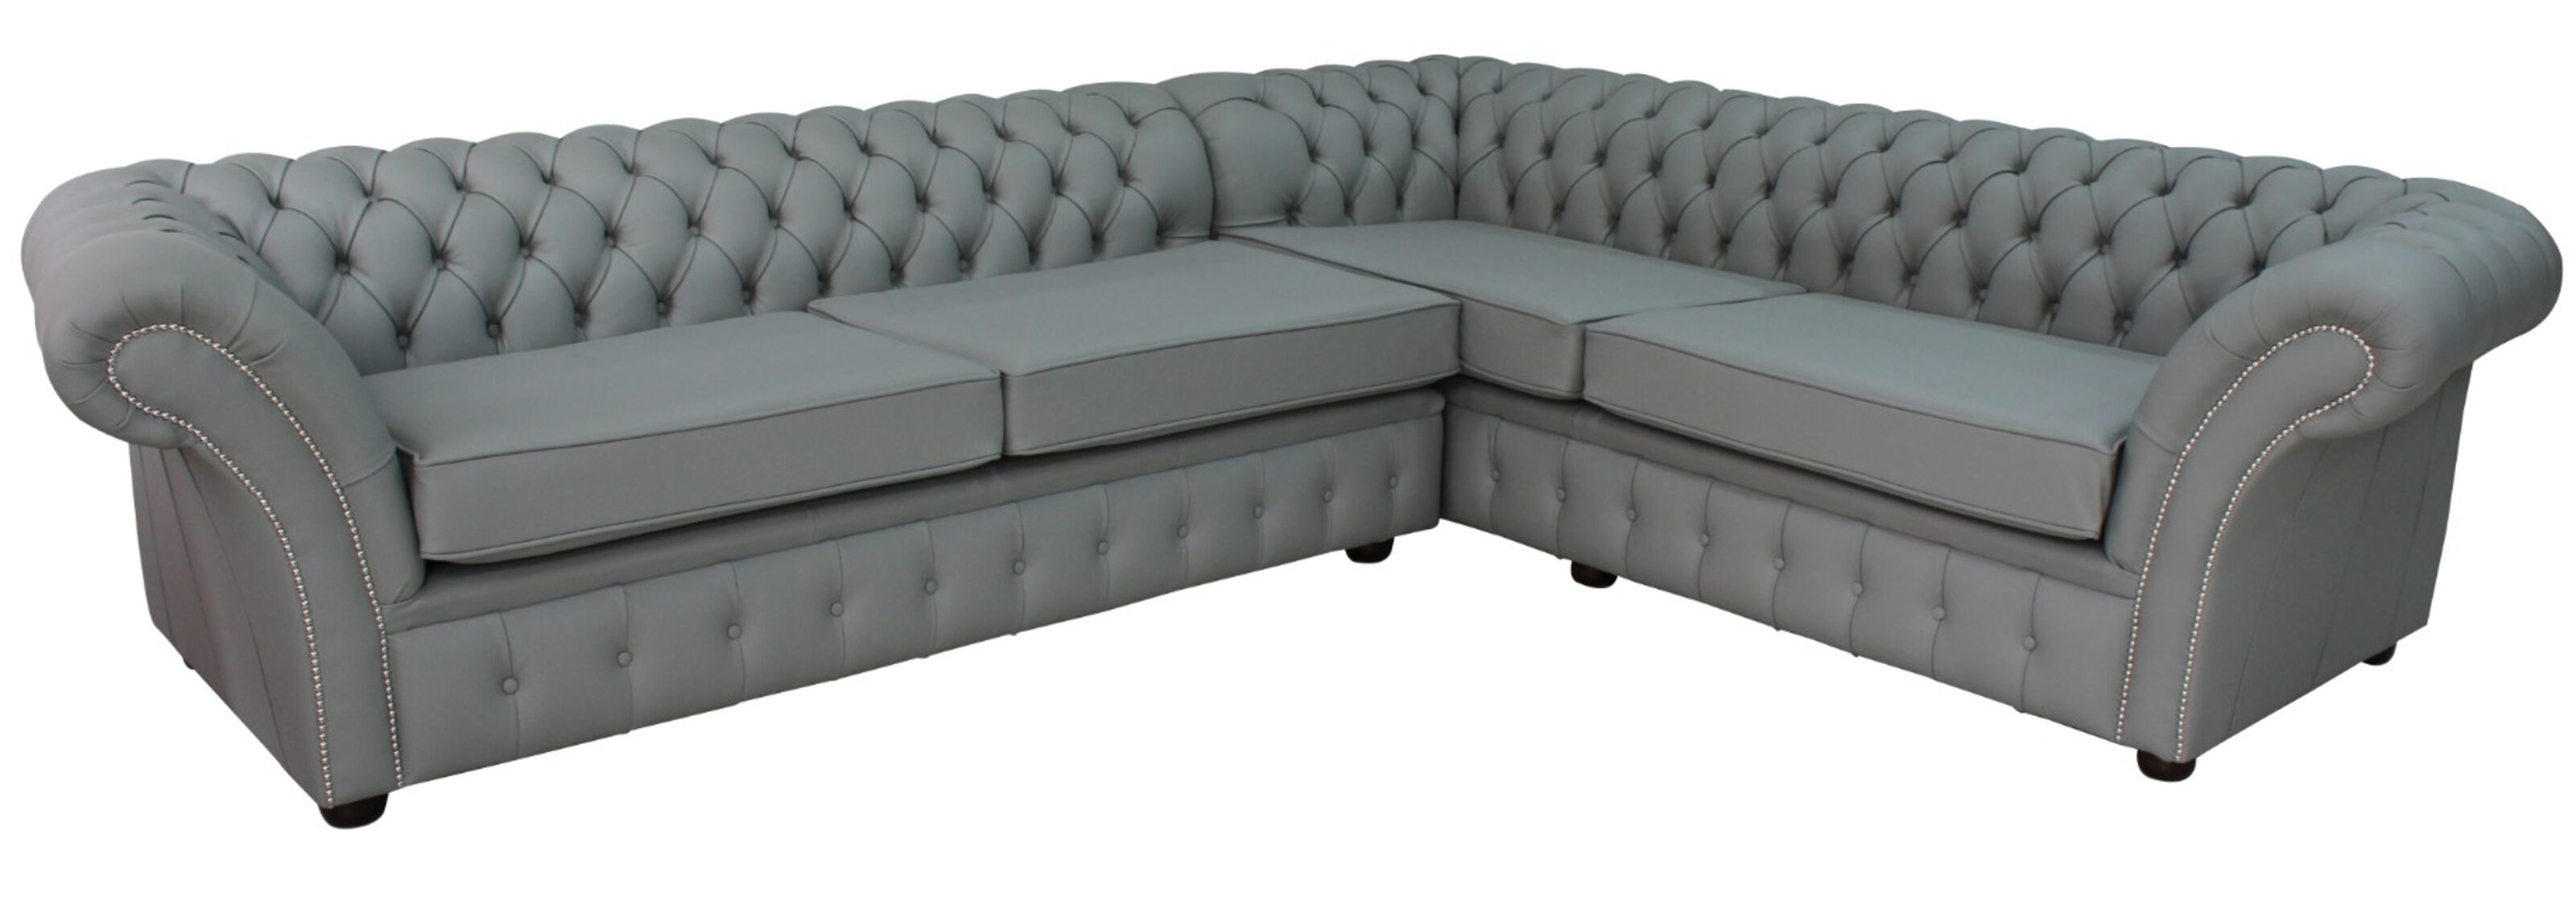 Chesterfield Balmoral Square Corner Sofa Unit Cushioned 3 Seater